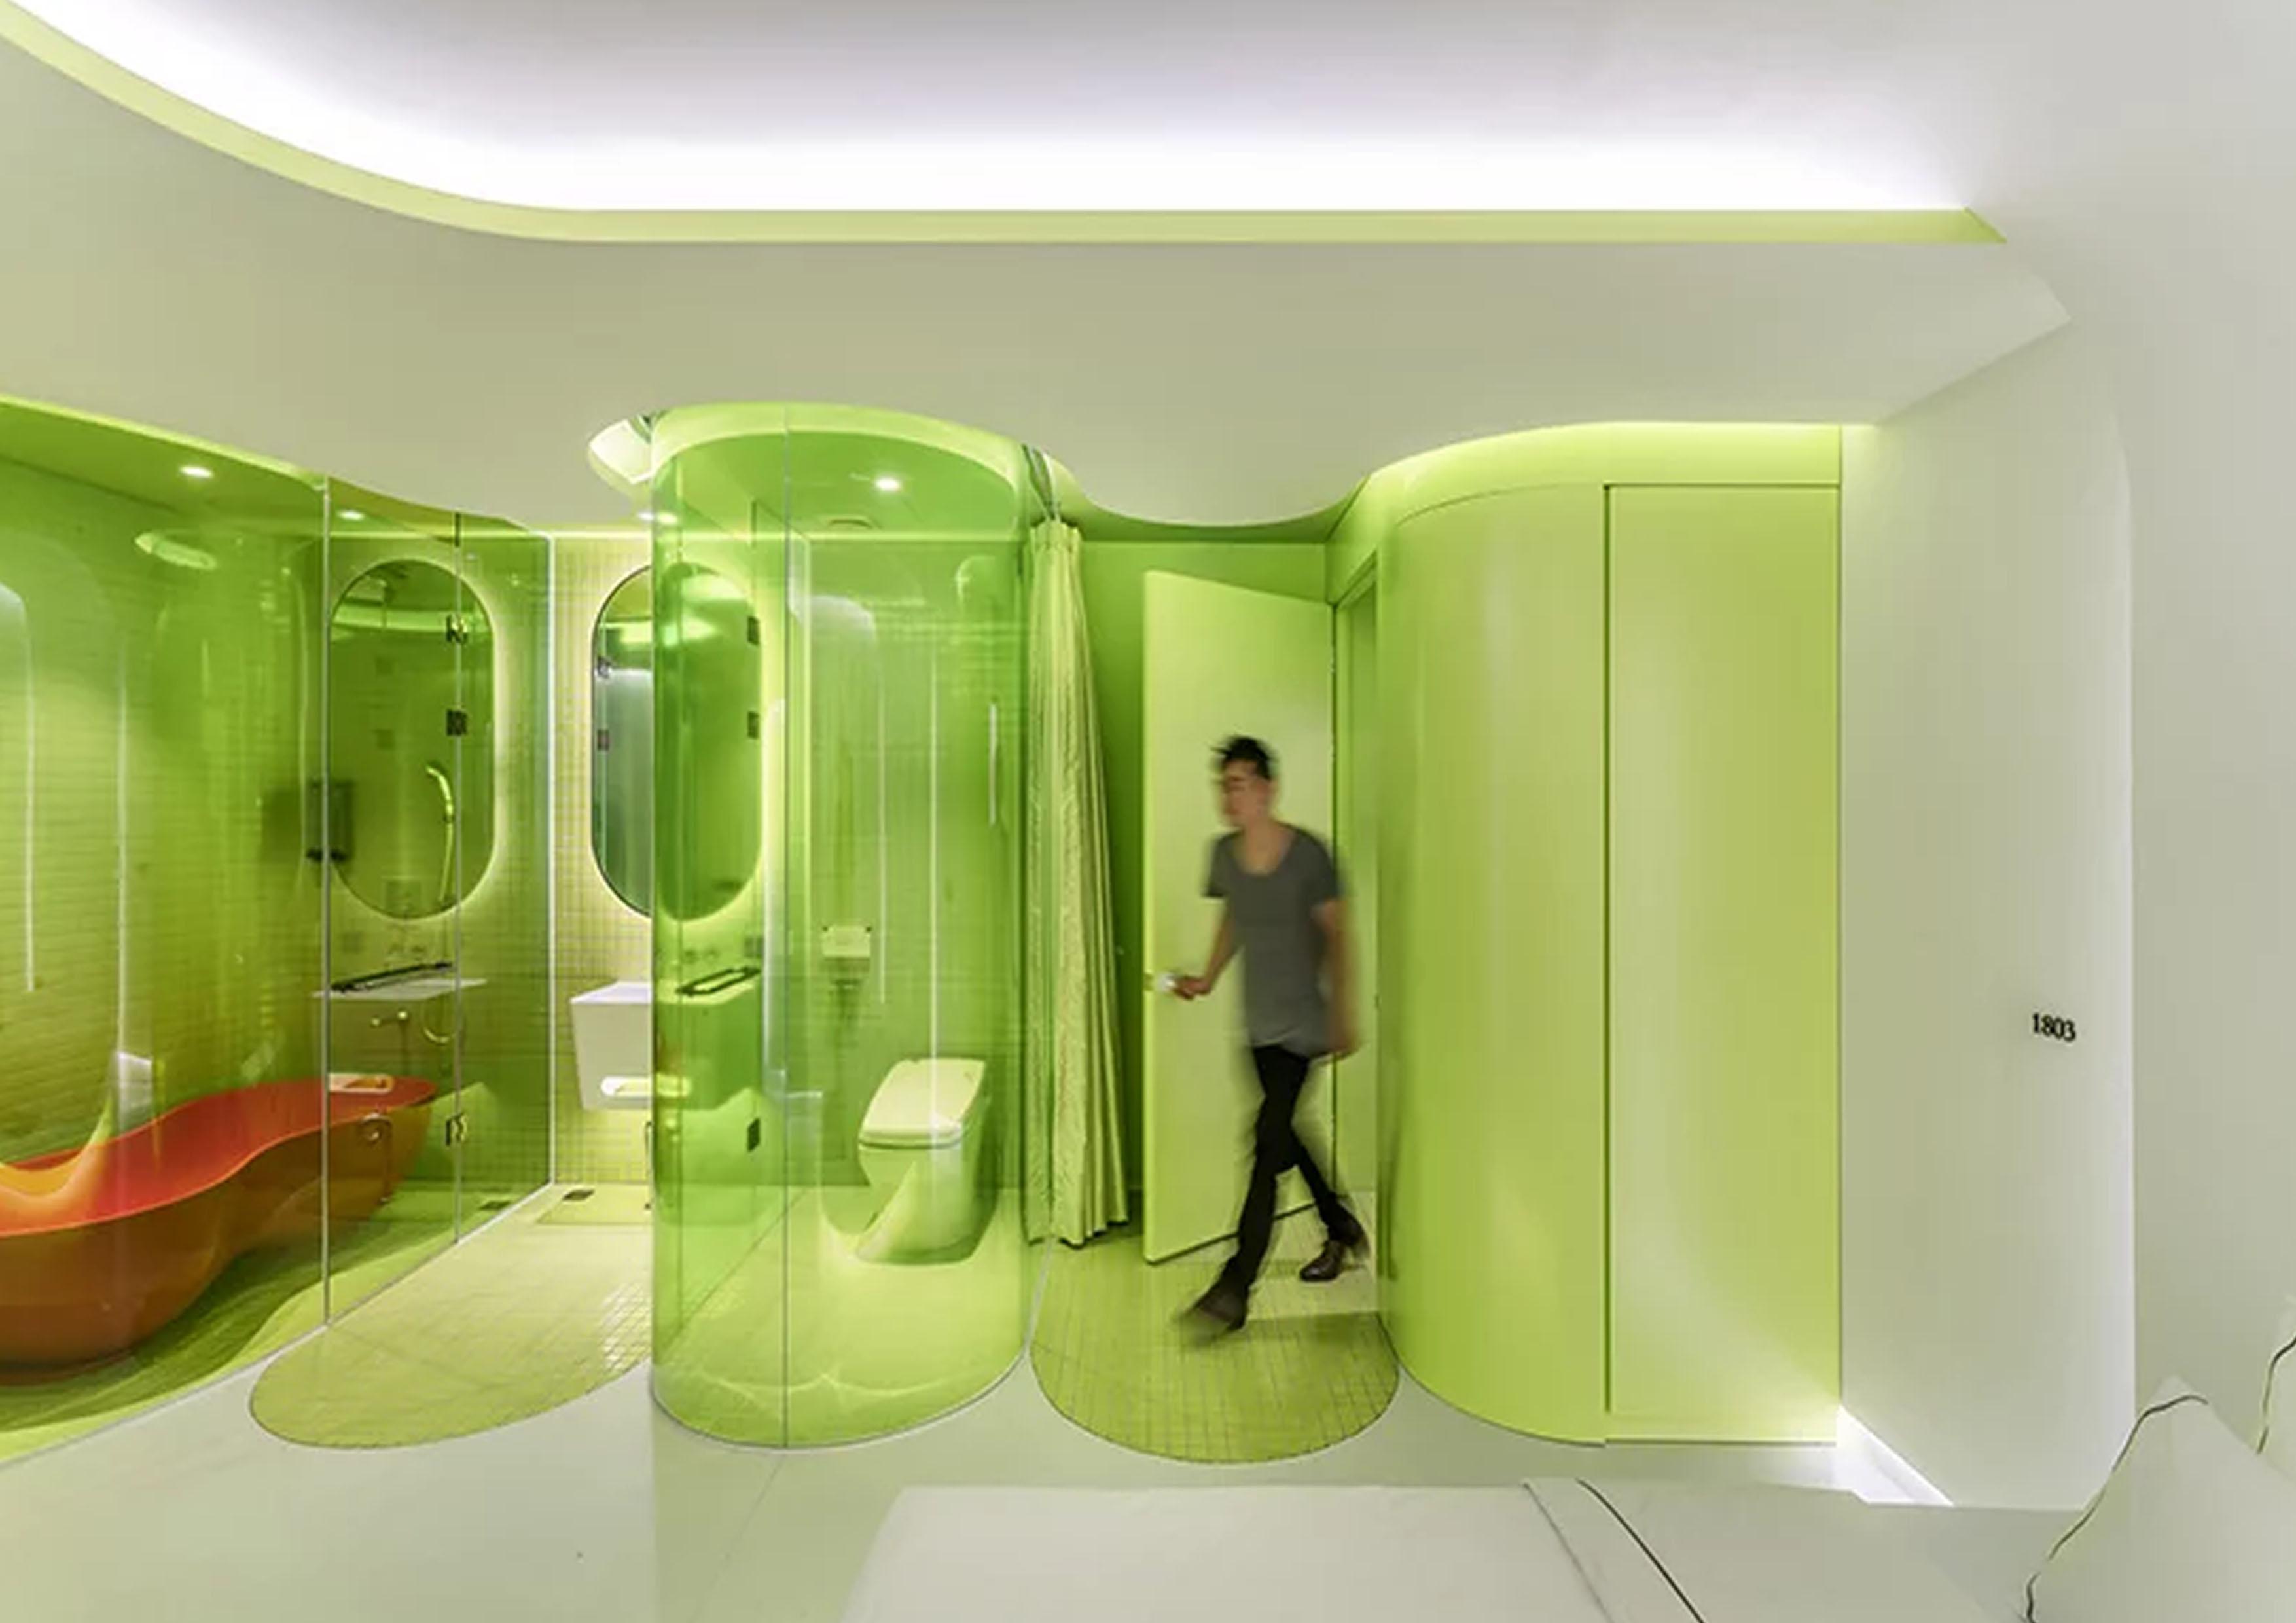 SML imagine une suite vert citron au design complètement futuriste !